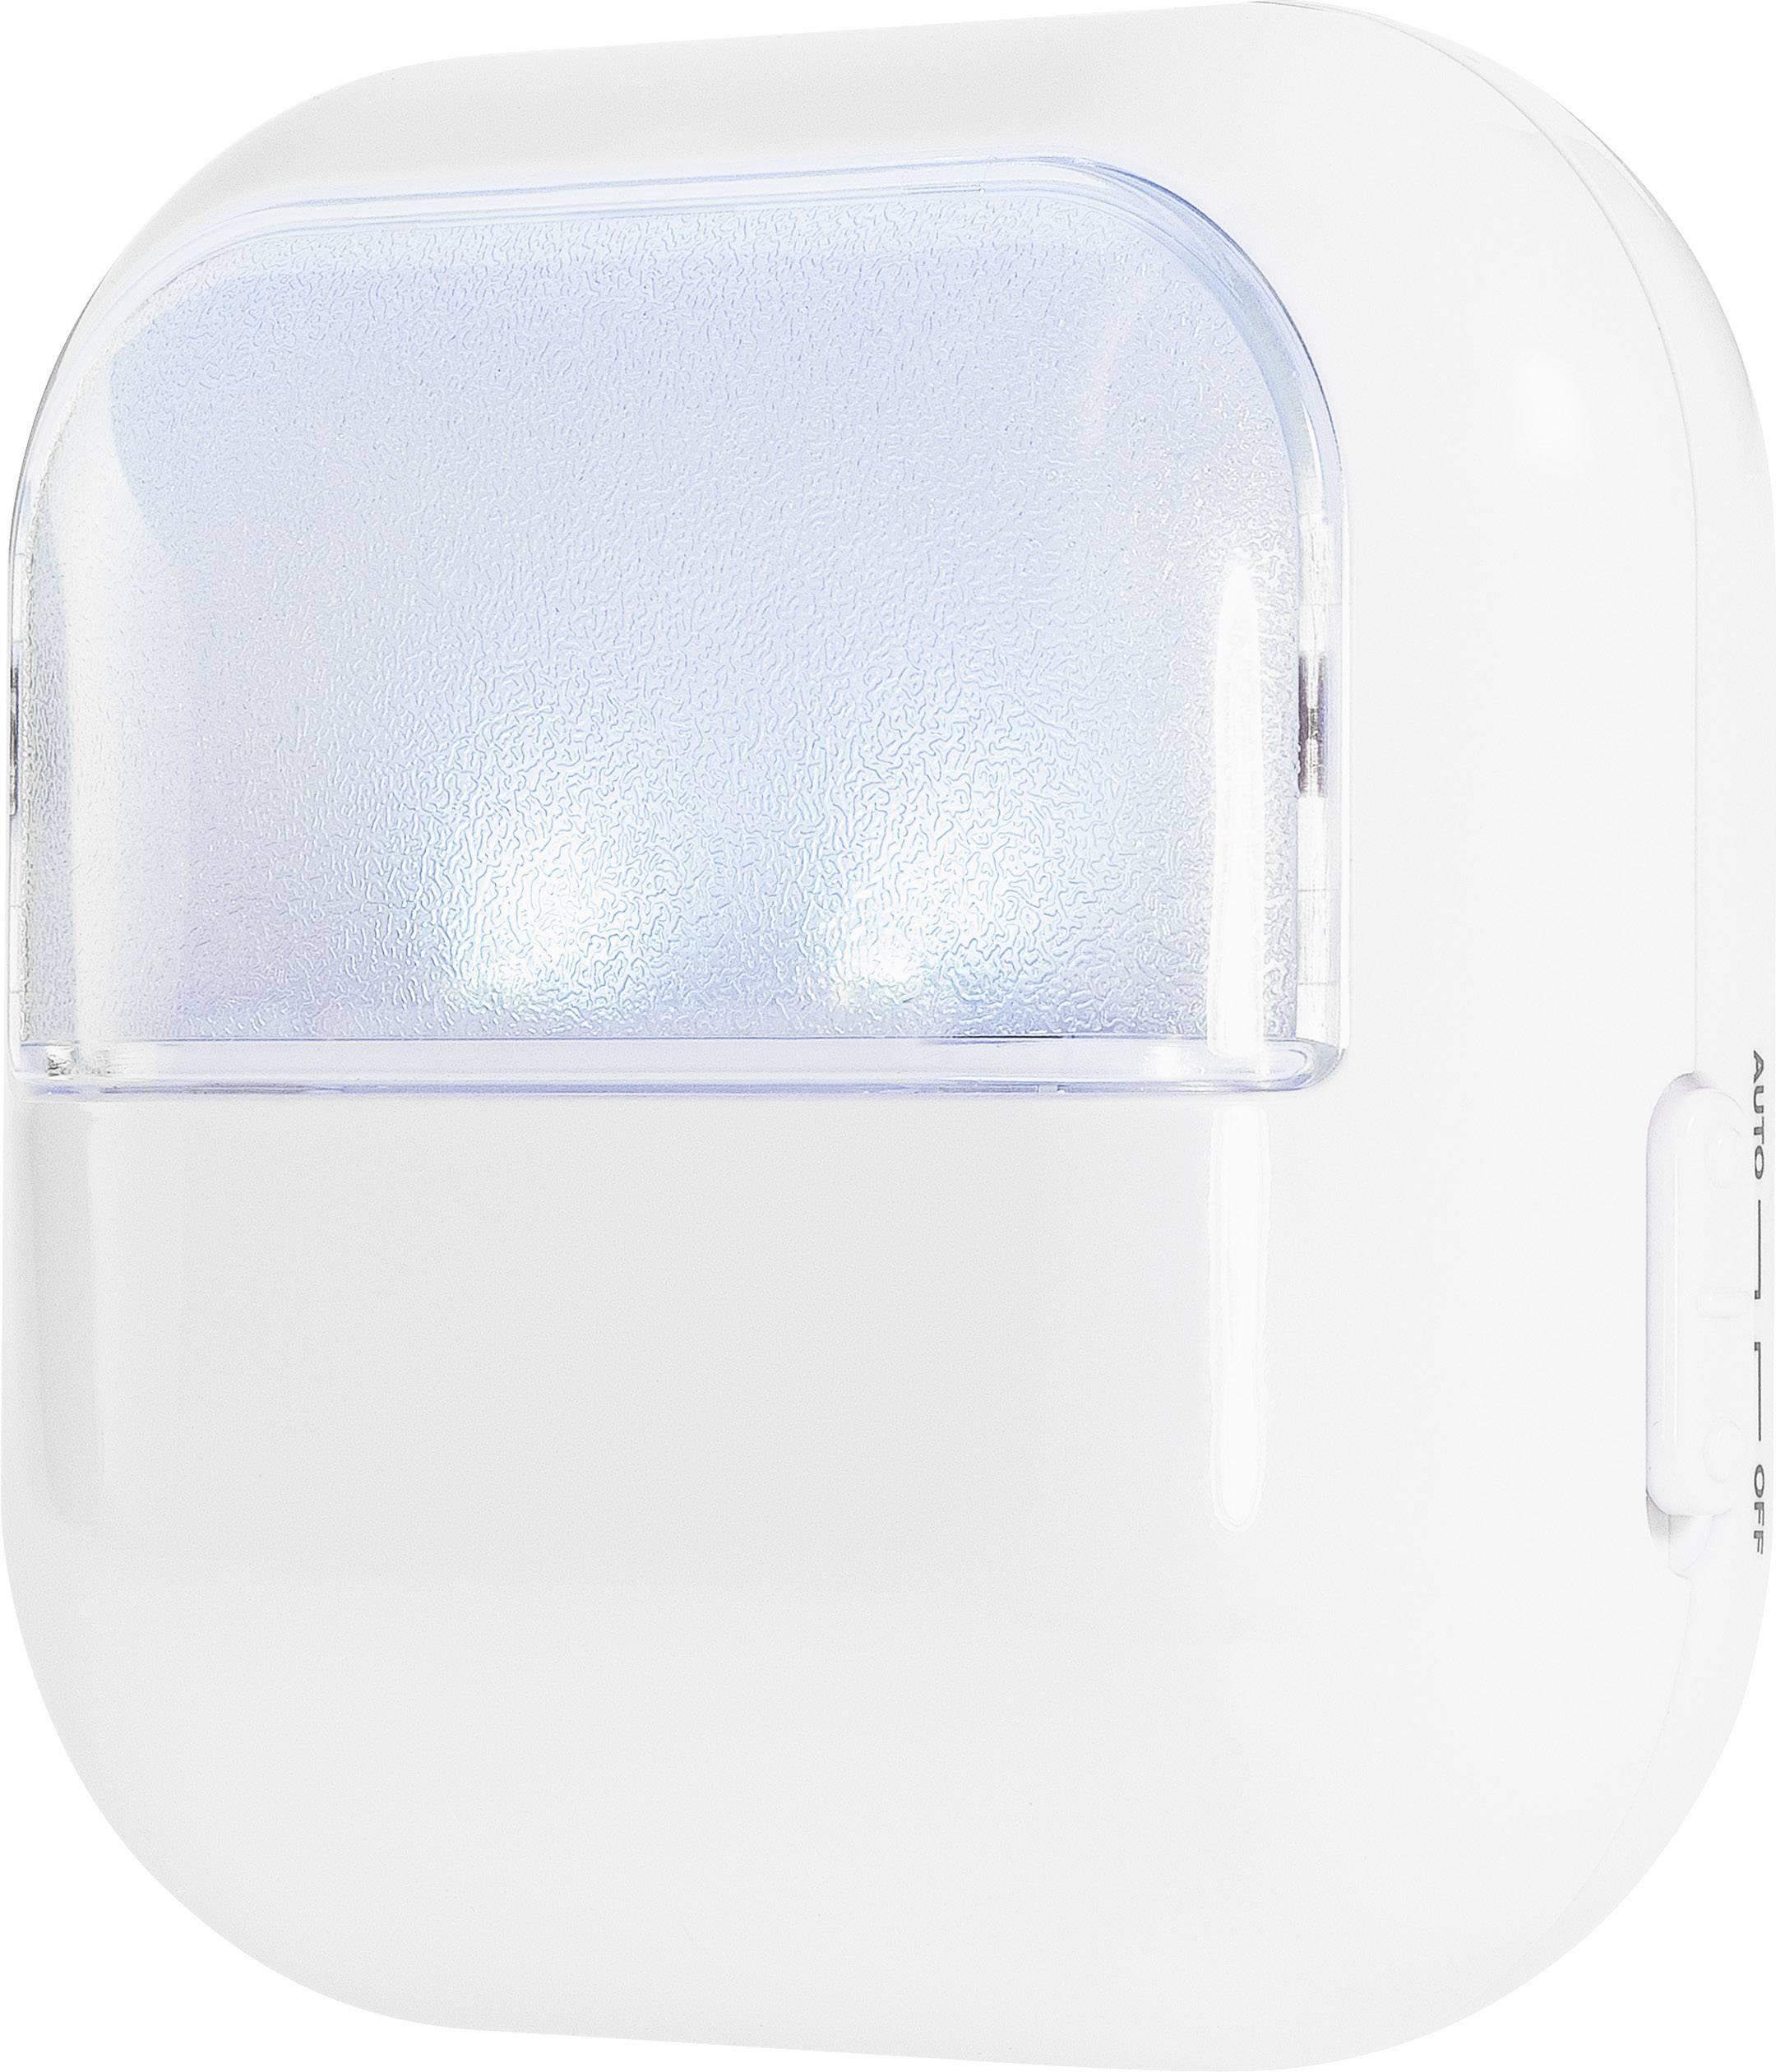 Noční LED svítidlo Renkforce Kim, N047, 0,05 W, studená bílá/bílá